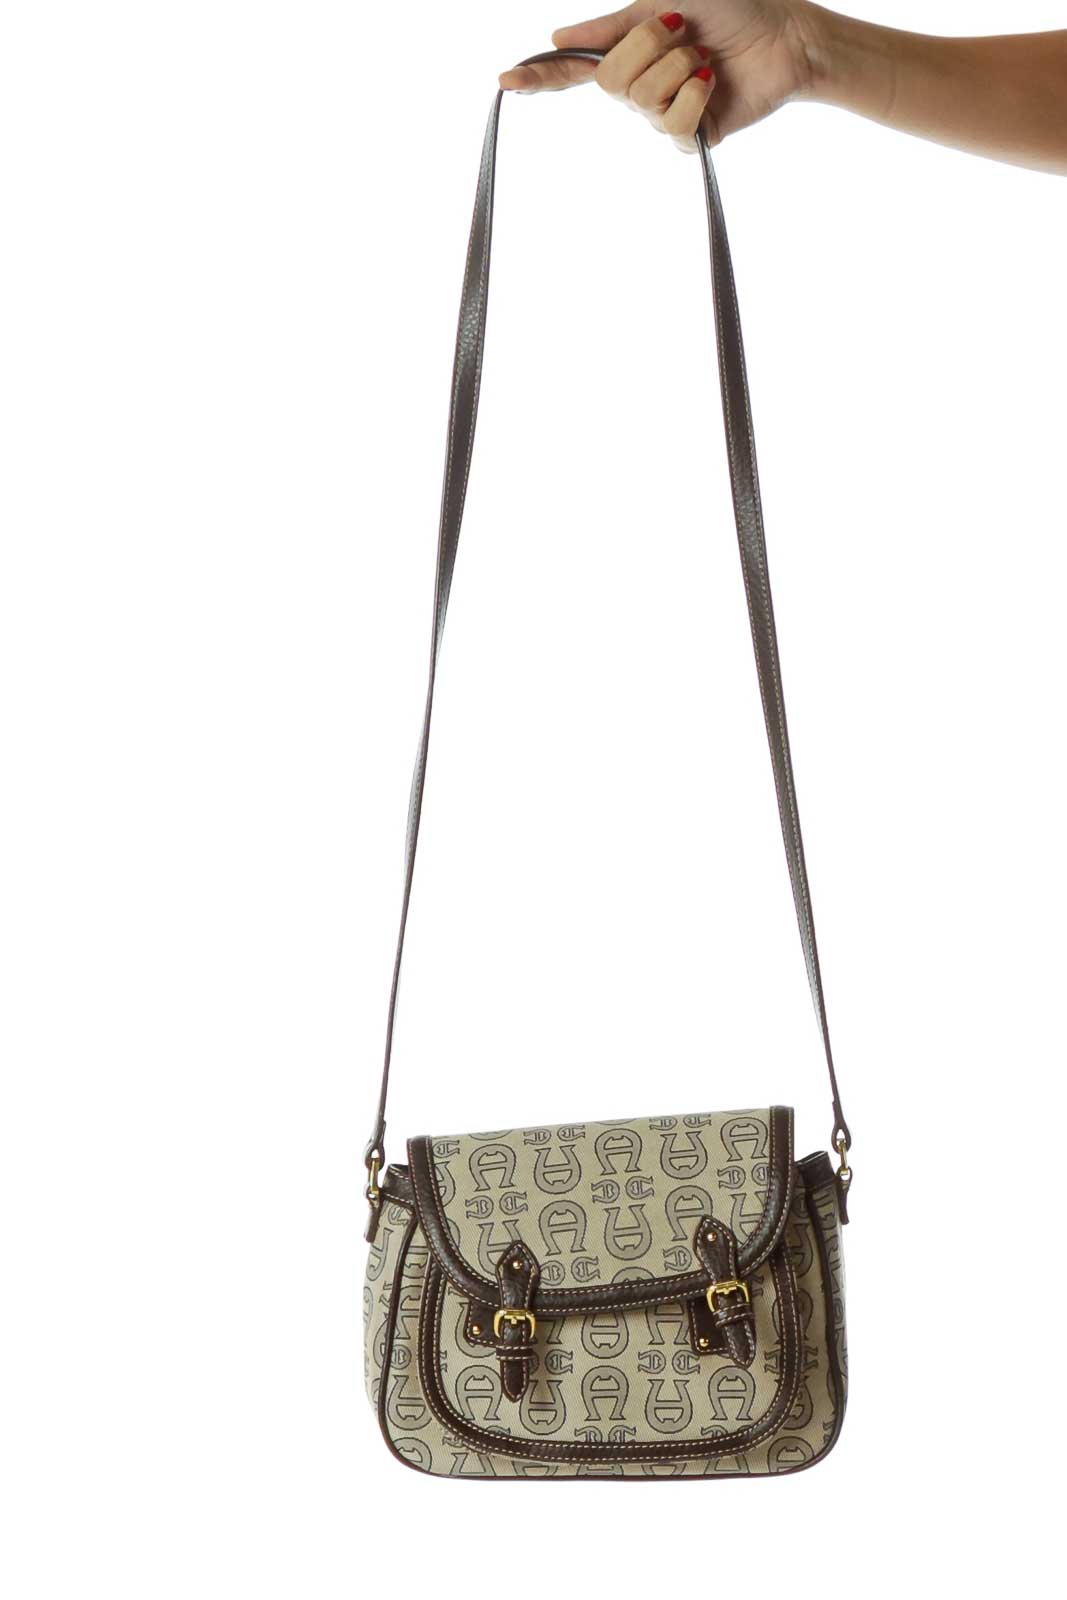 Brown Beige Monogrammed Crossbody Bag Front